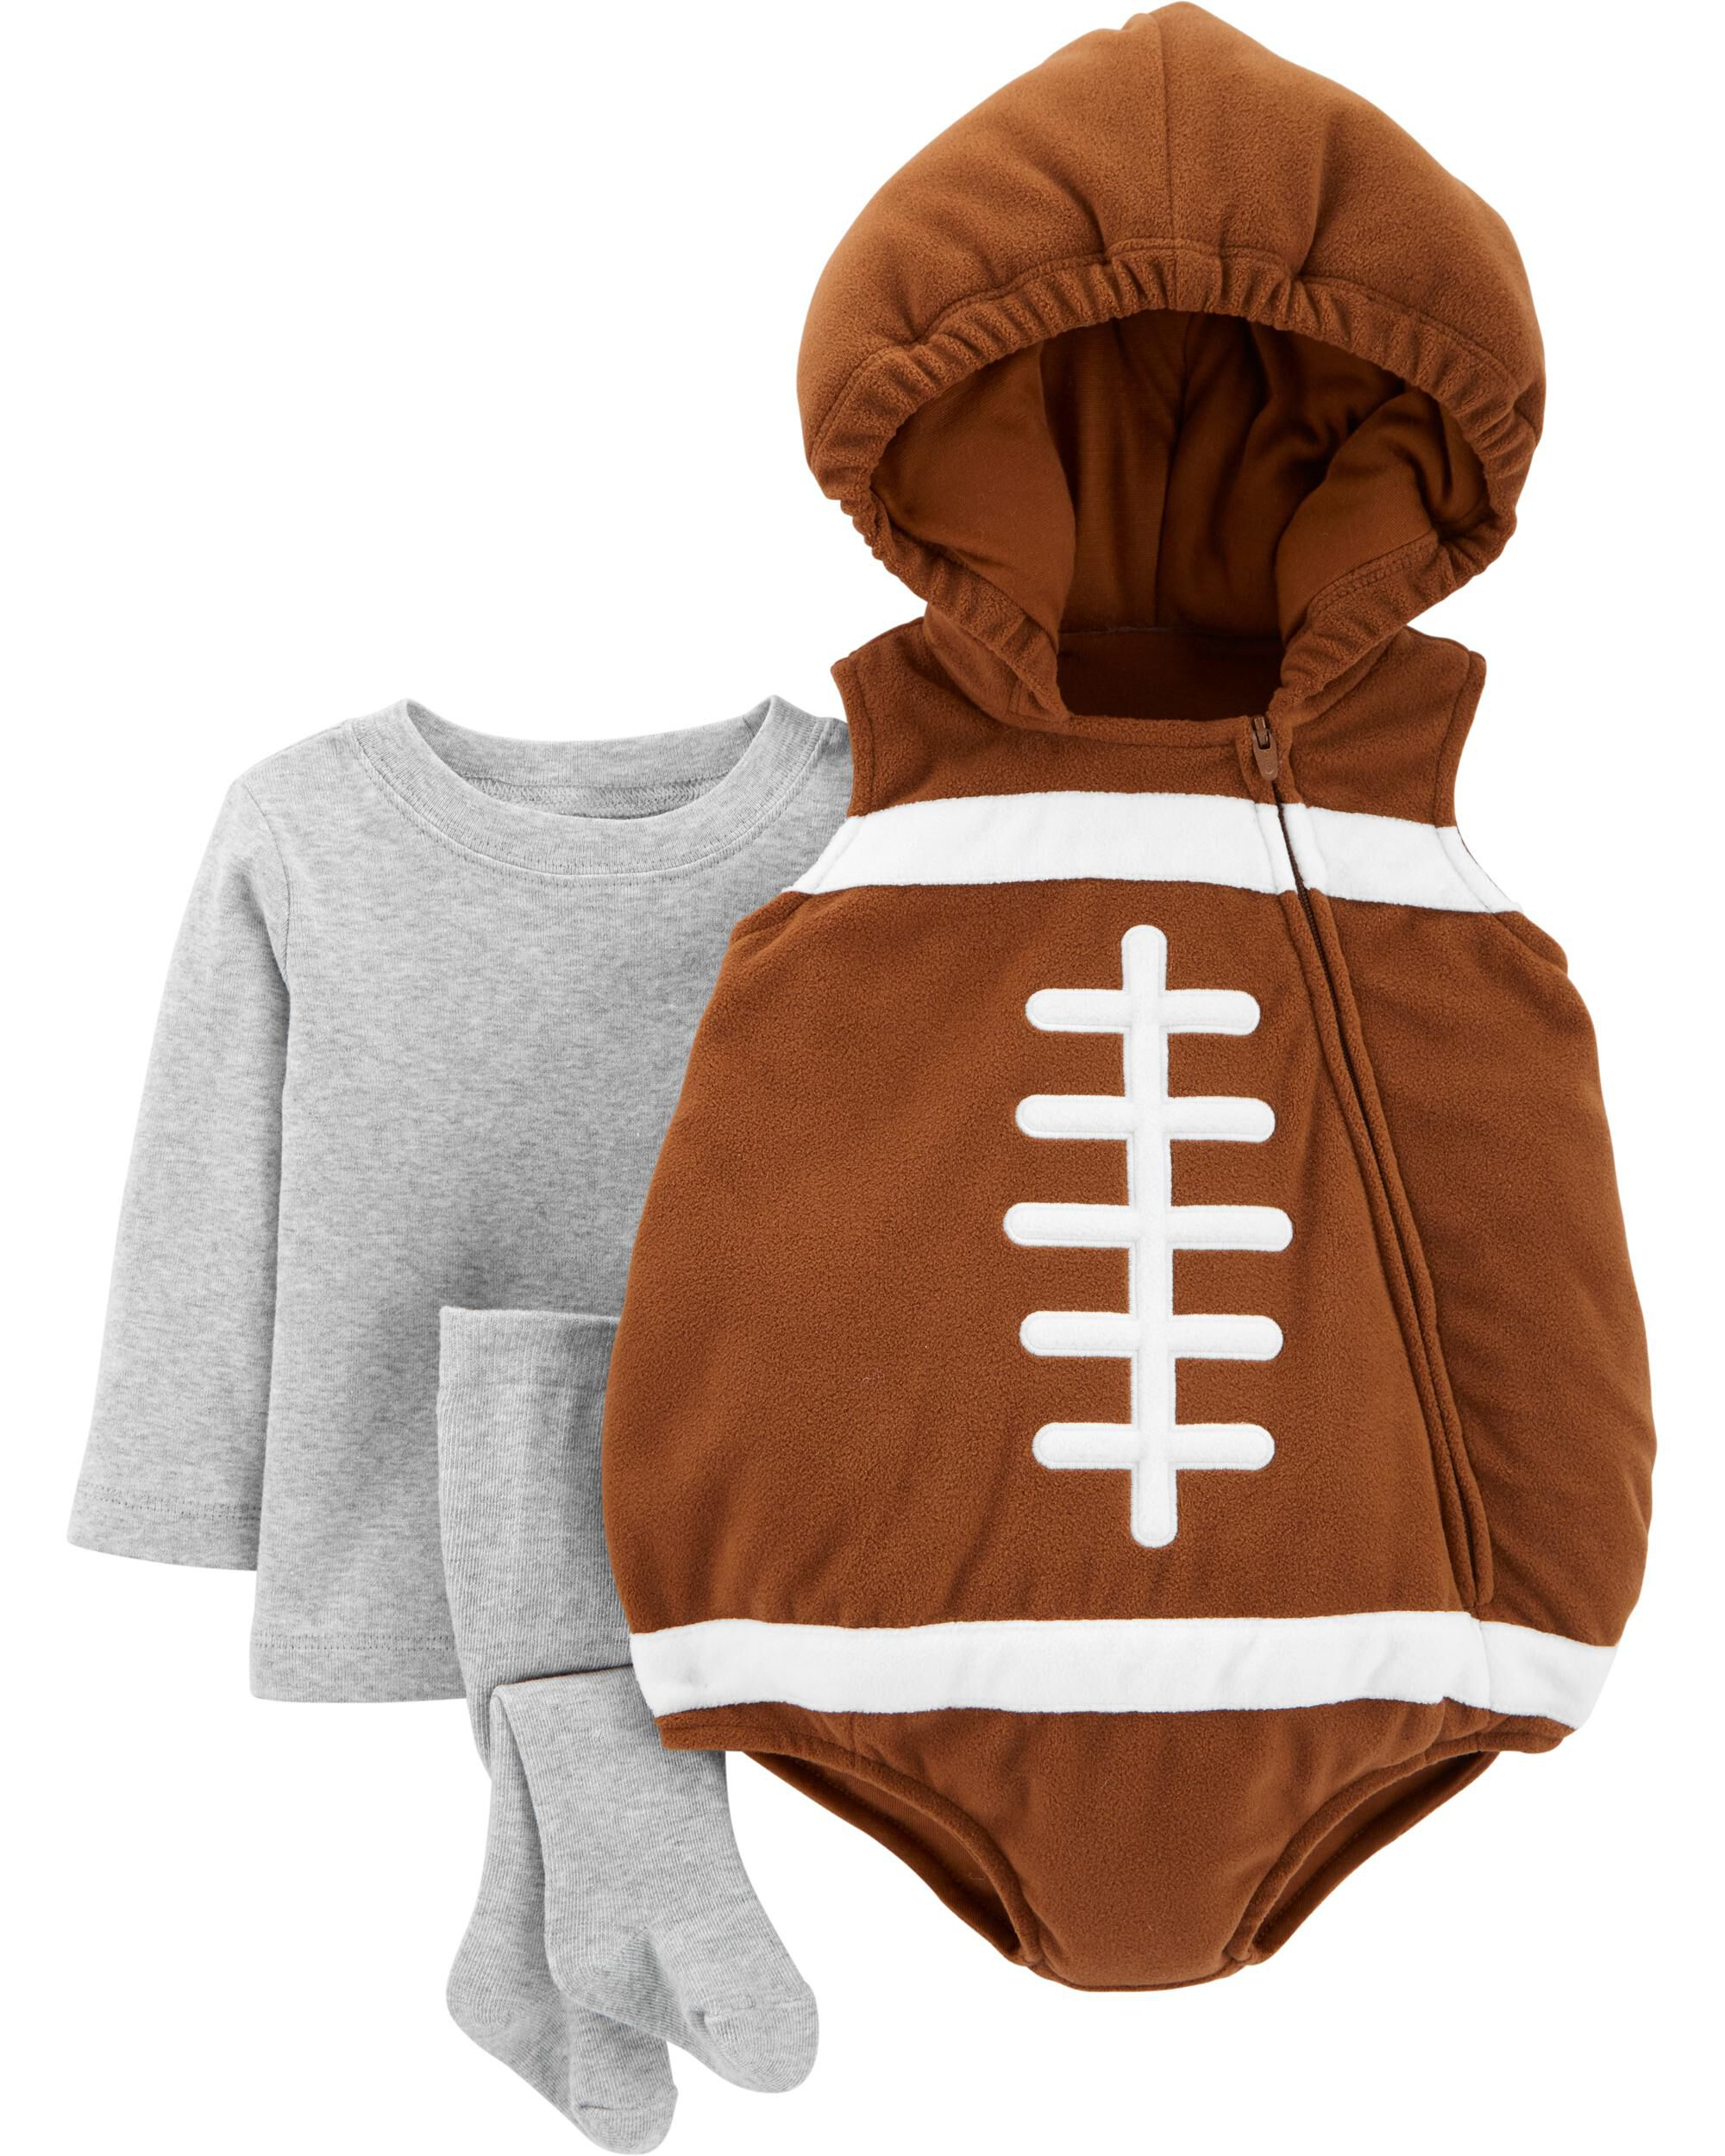 Carters Little Football Halloween Costume